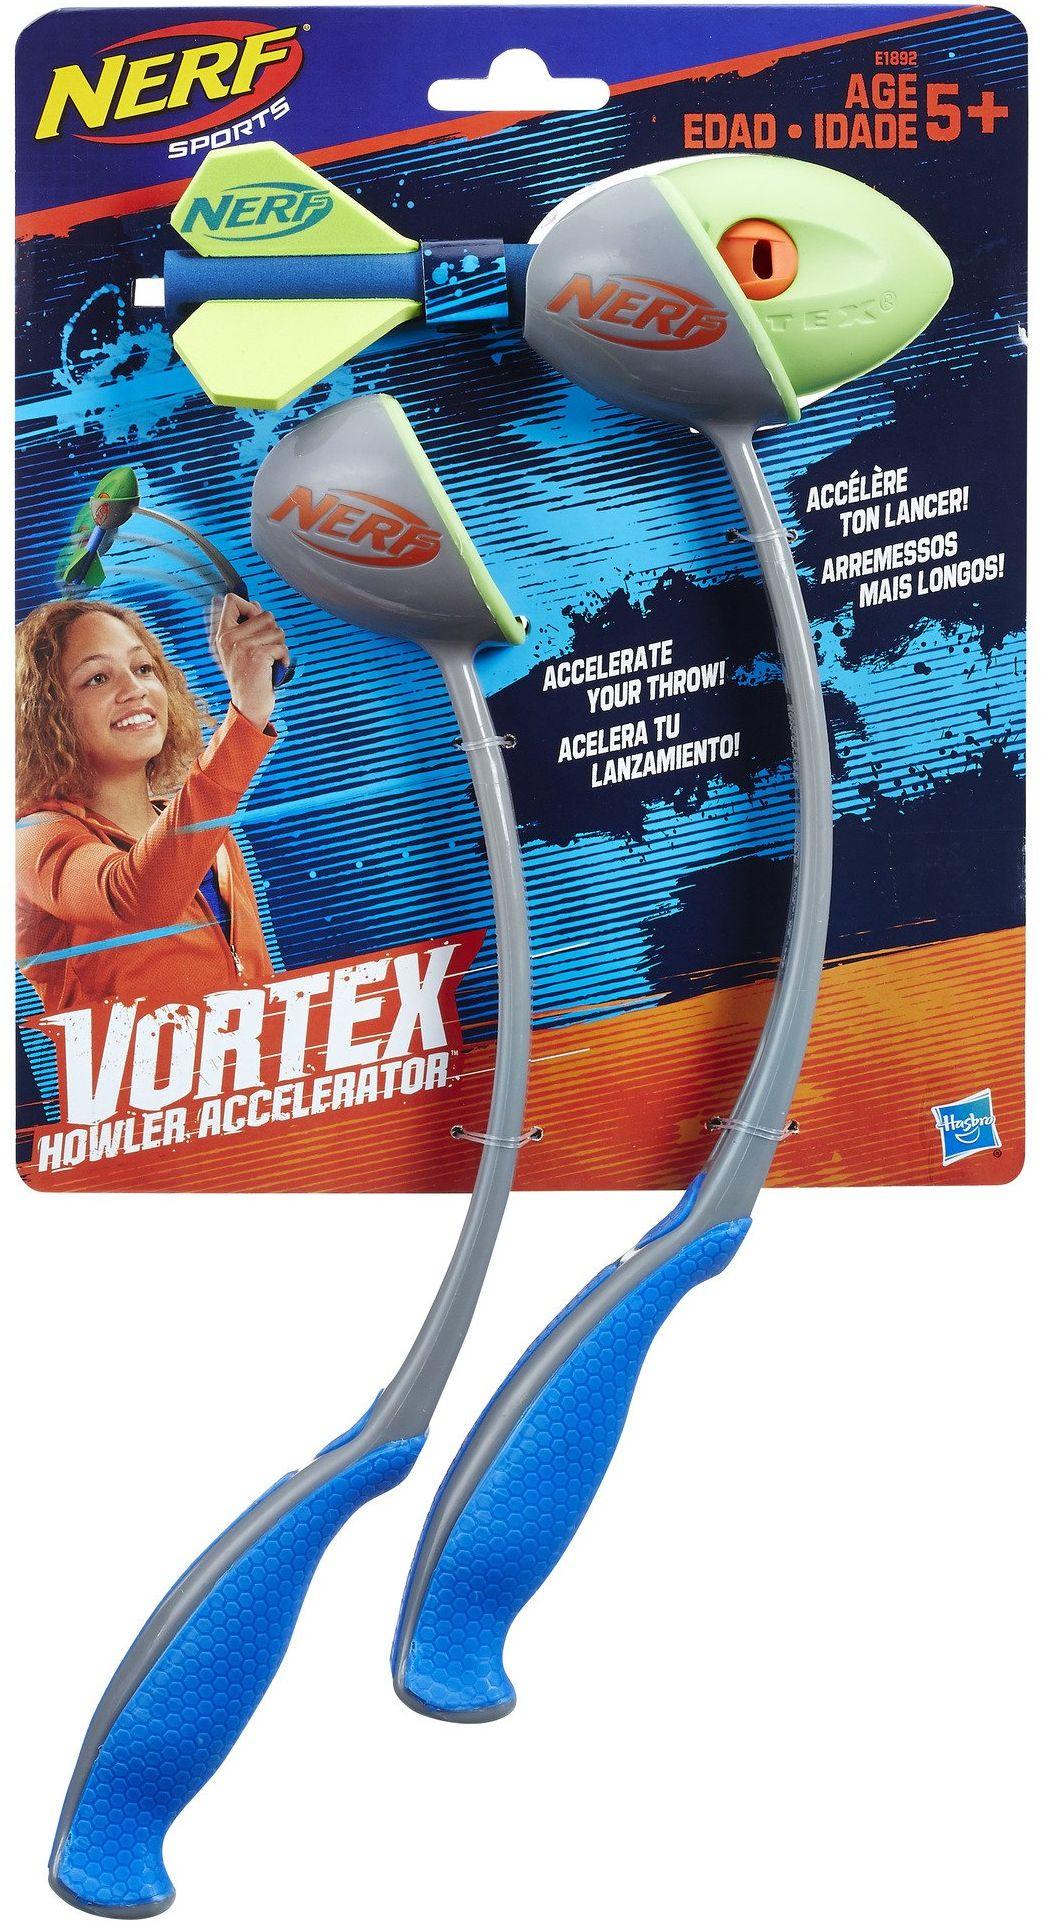 Nerf Sports Vortex Howler akcelerator